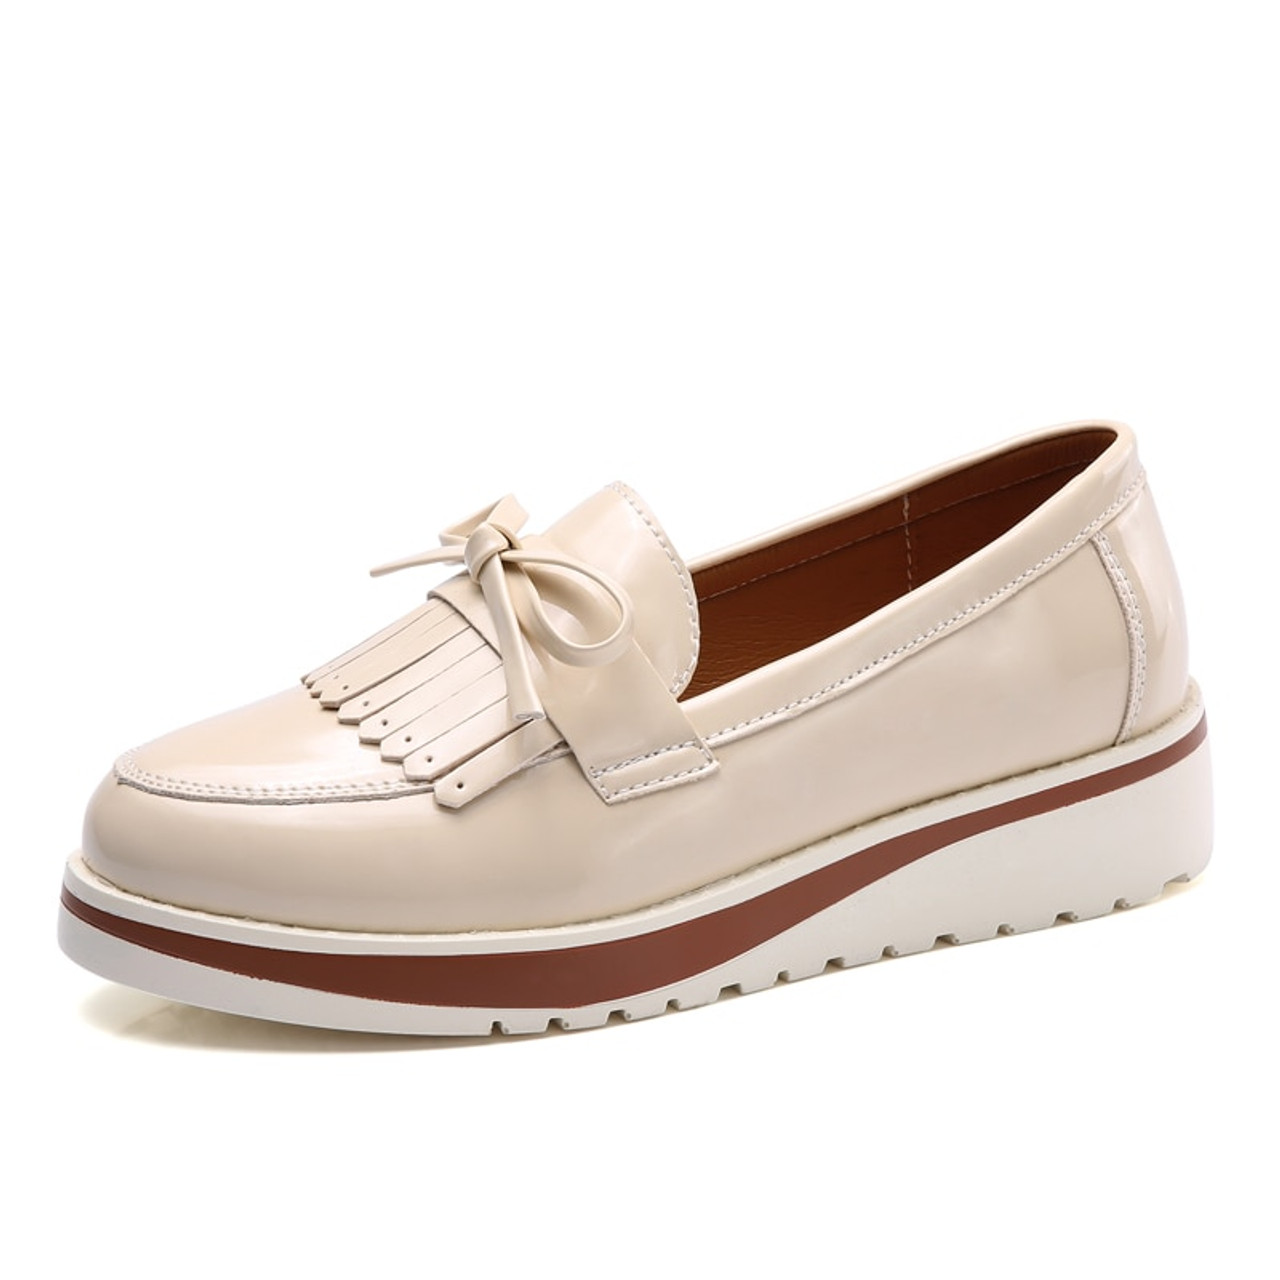 f09fcb7f15d ... EOFK Flat Shoes Women Autumn Black Patent Leather Slip On Fringe Sweet  Woman Casual Loafers Women s ...